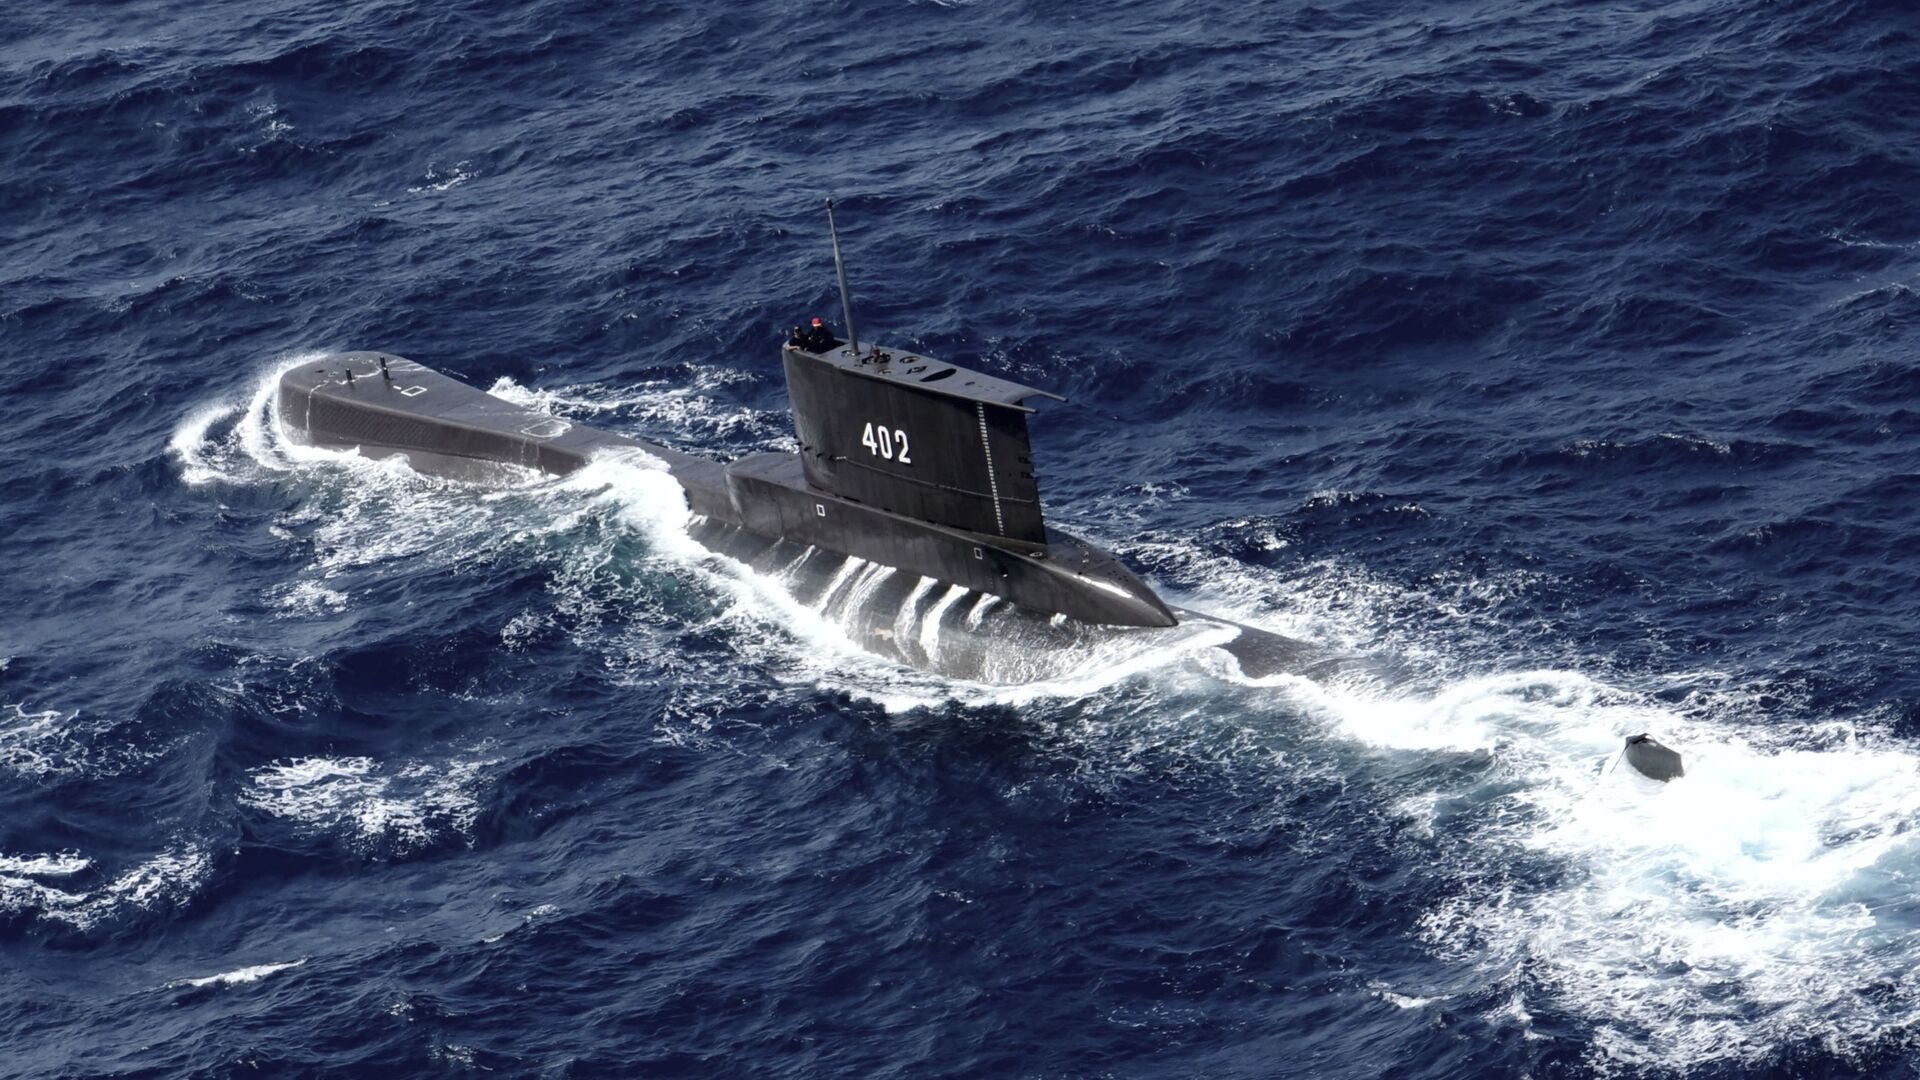 Il sottomarino indonesiano KRI Nanggala - Sputnik Italia, 1920, 18.09.2021